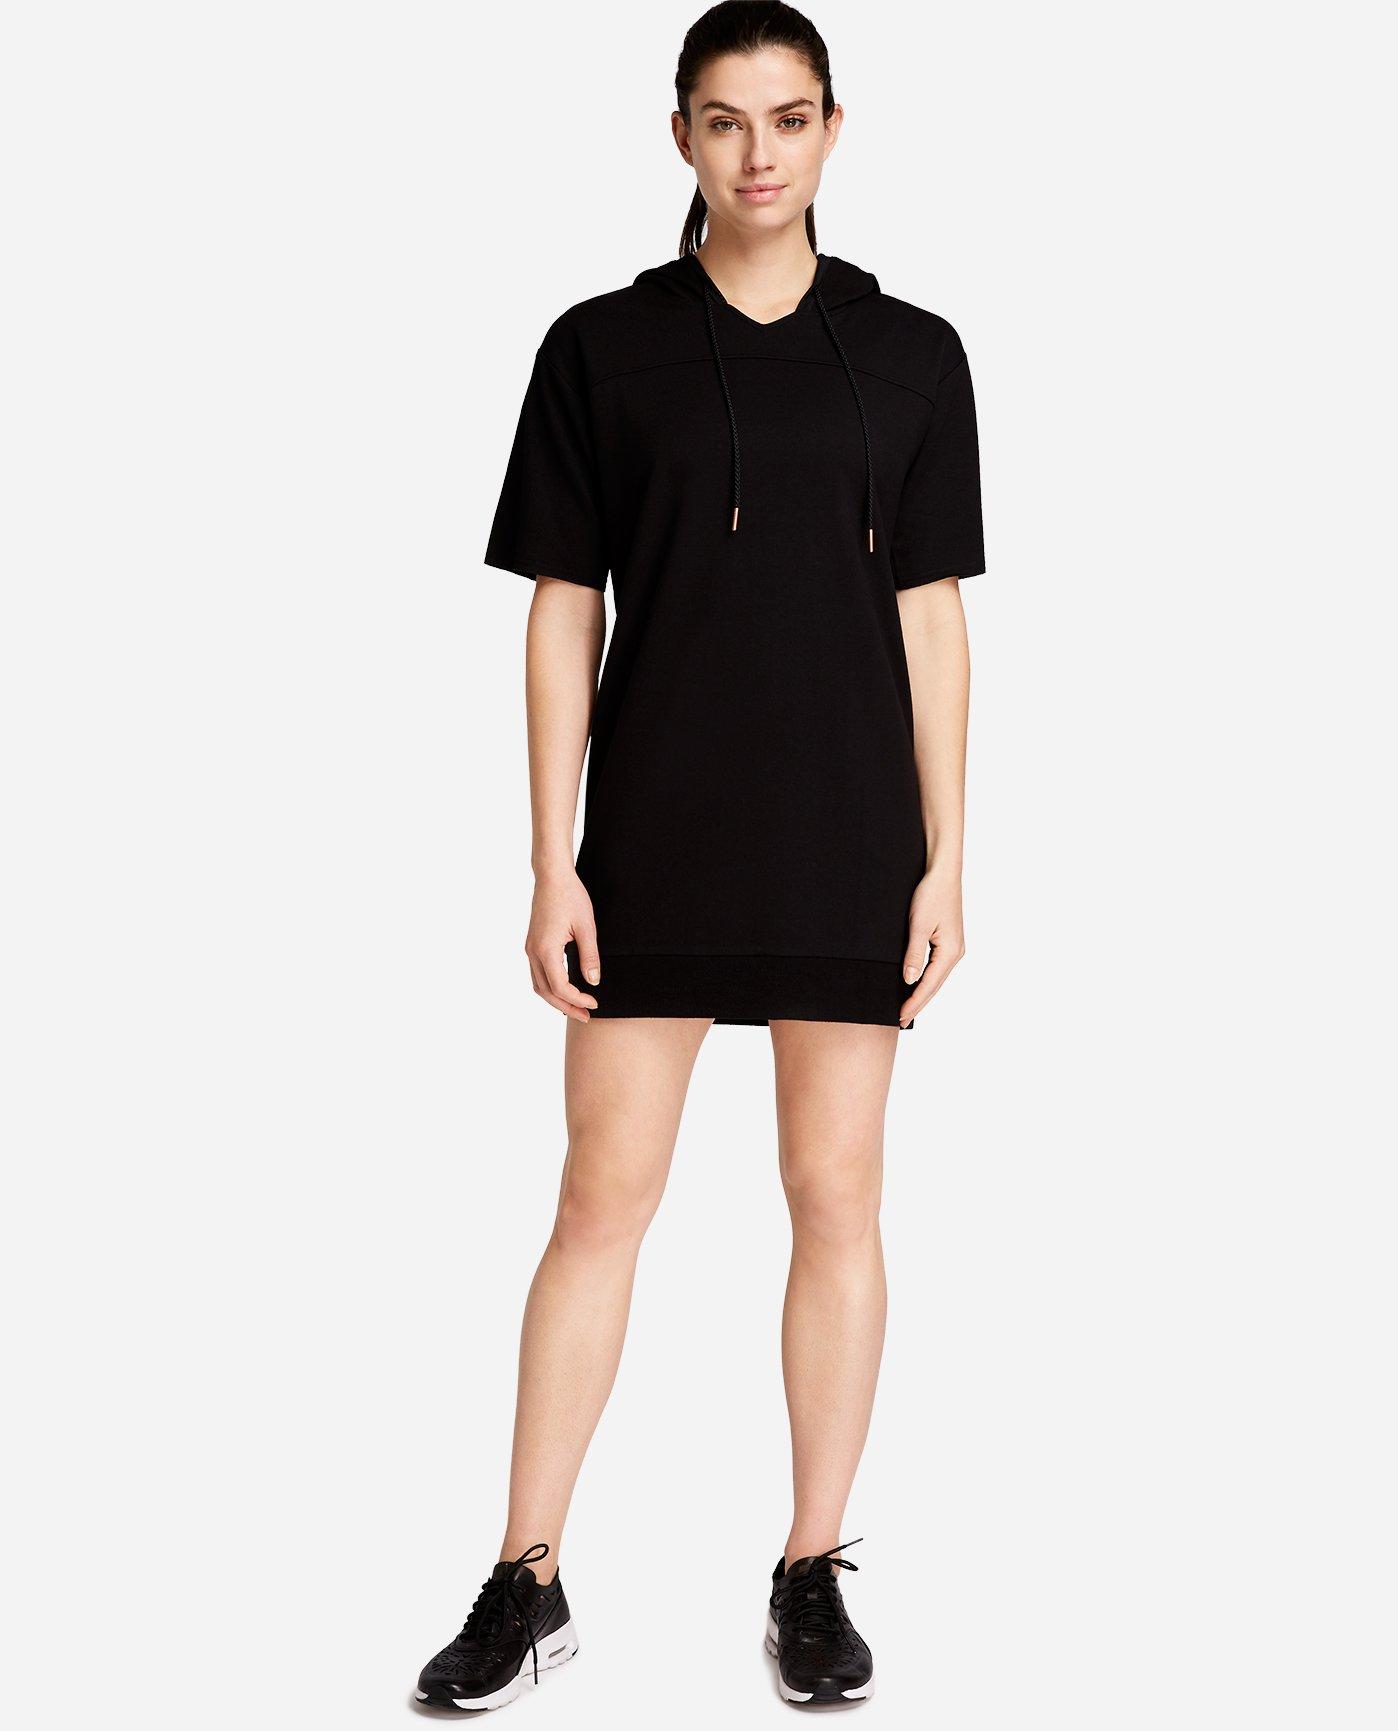 Hoodie Tunic Dress Jenna Dewan X Danskin